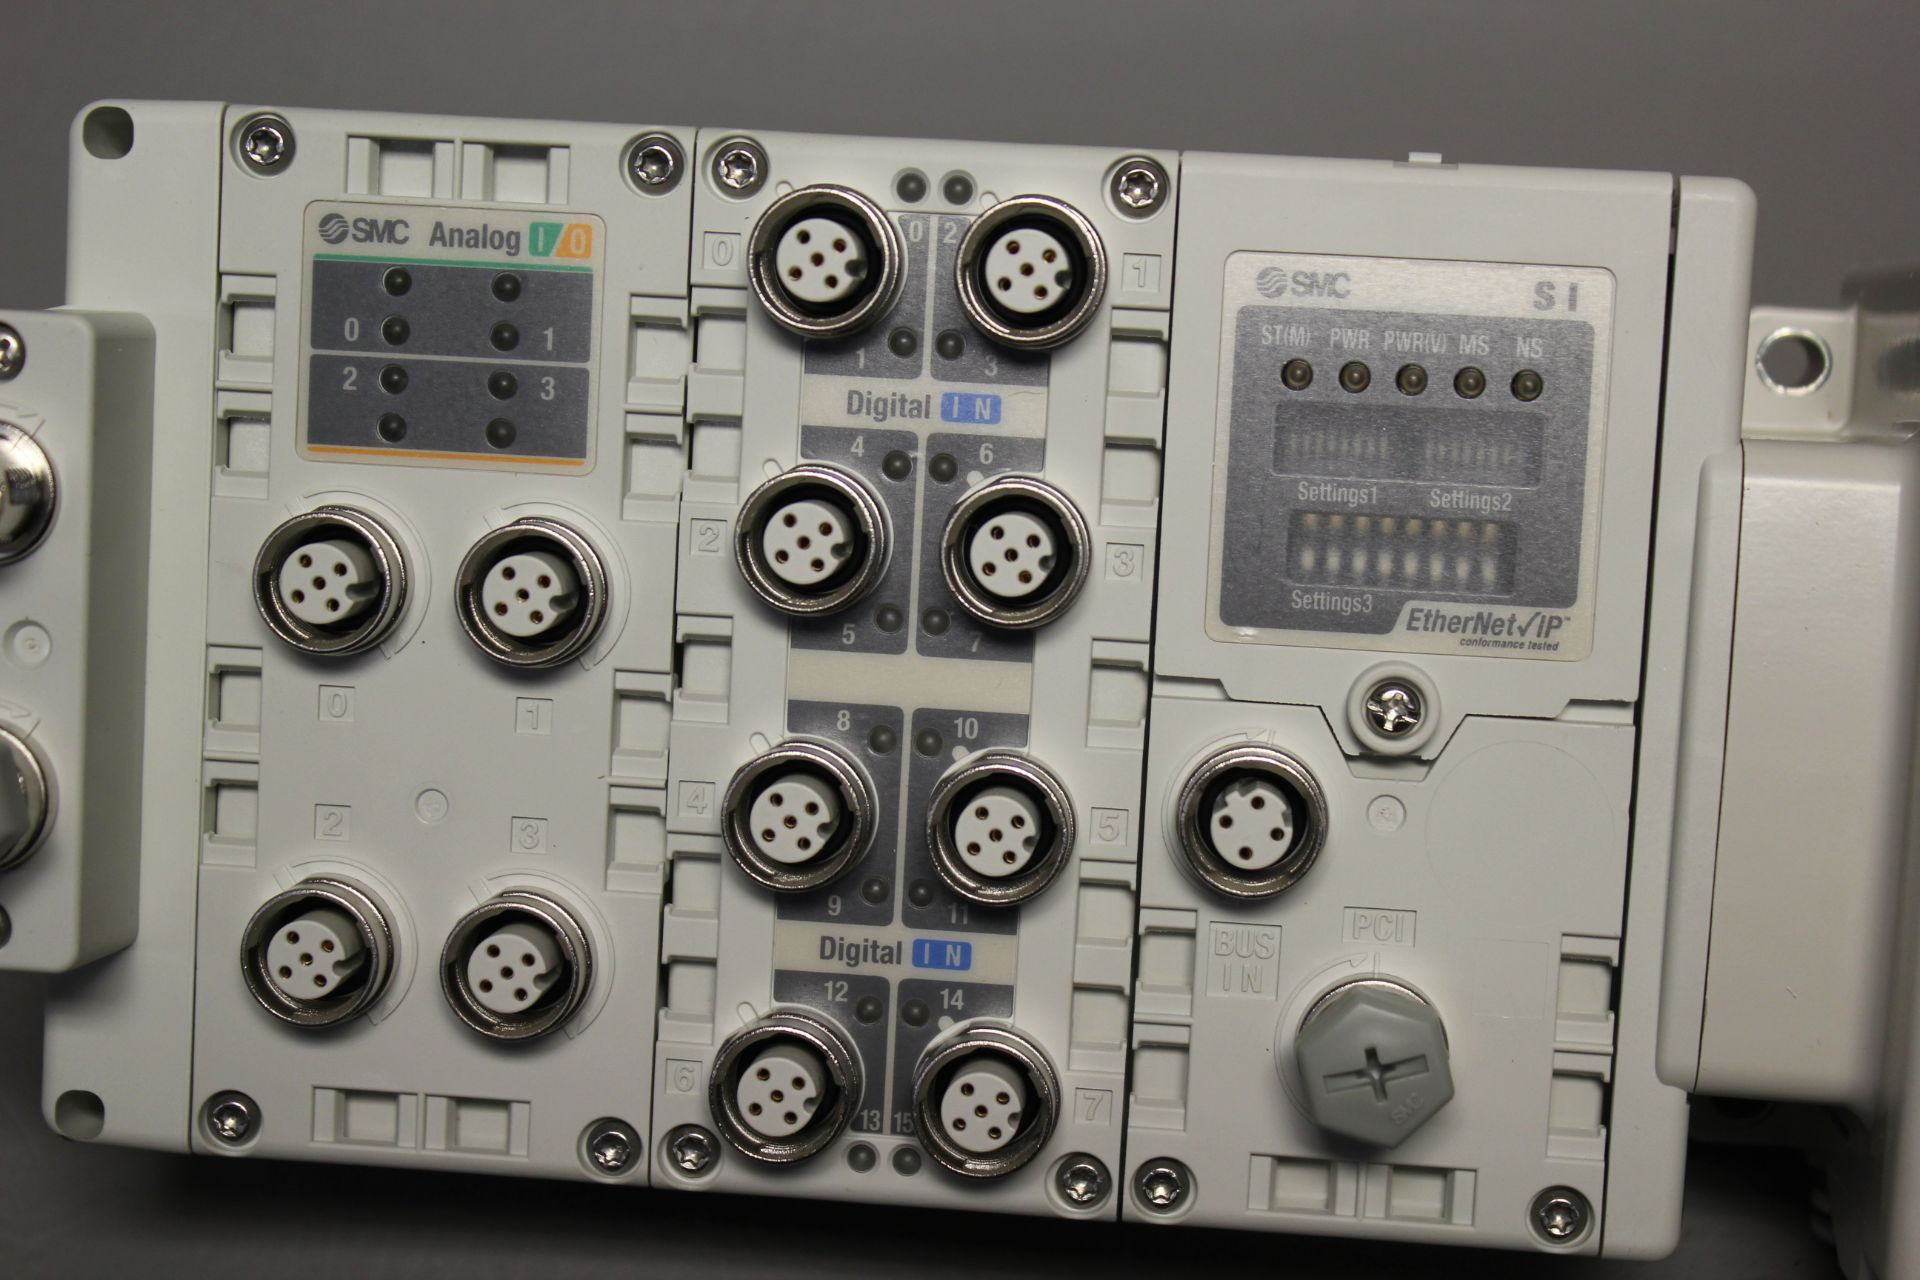 NEW SMC MANIFOLD WITH SOLENOID VALVES, ETHERNET/IP I/O - Image 4 of 8